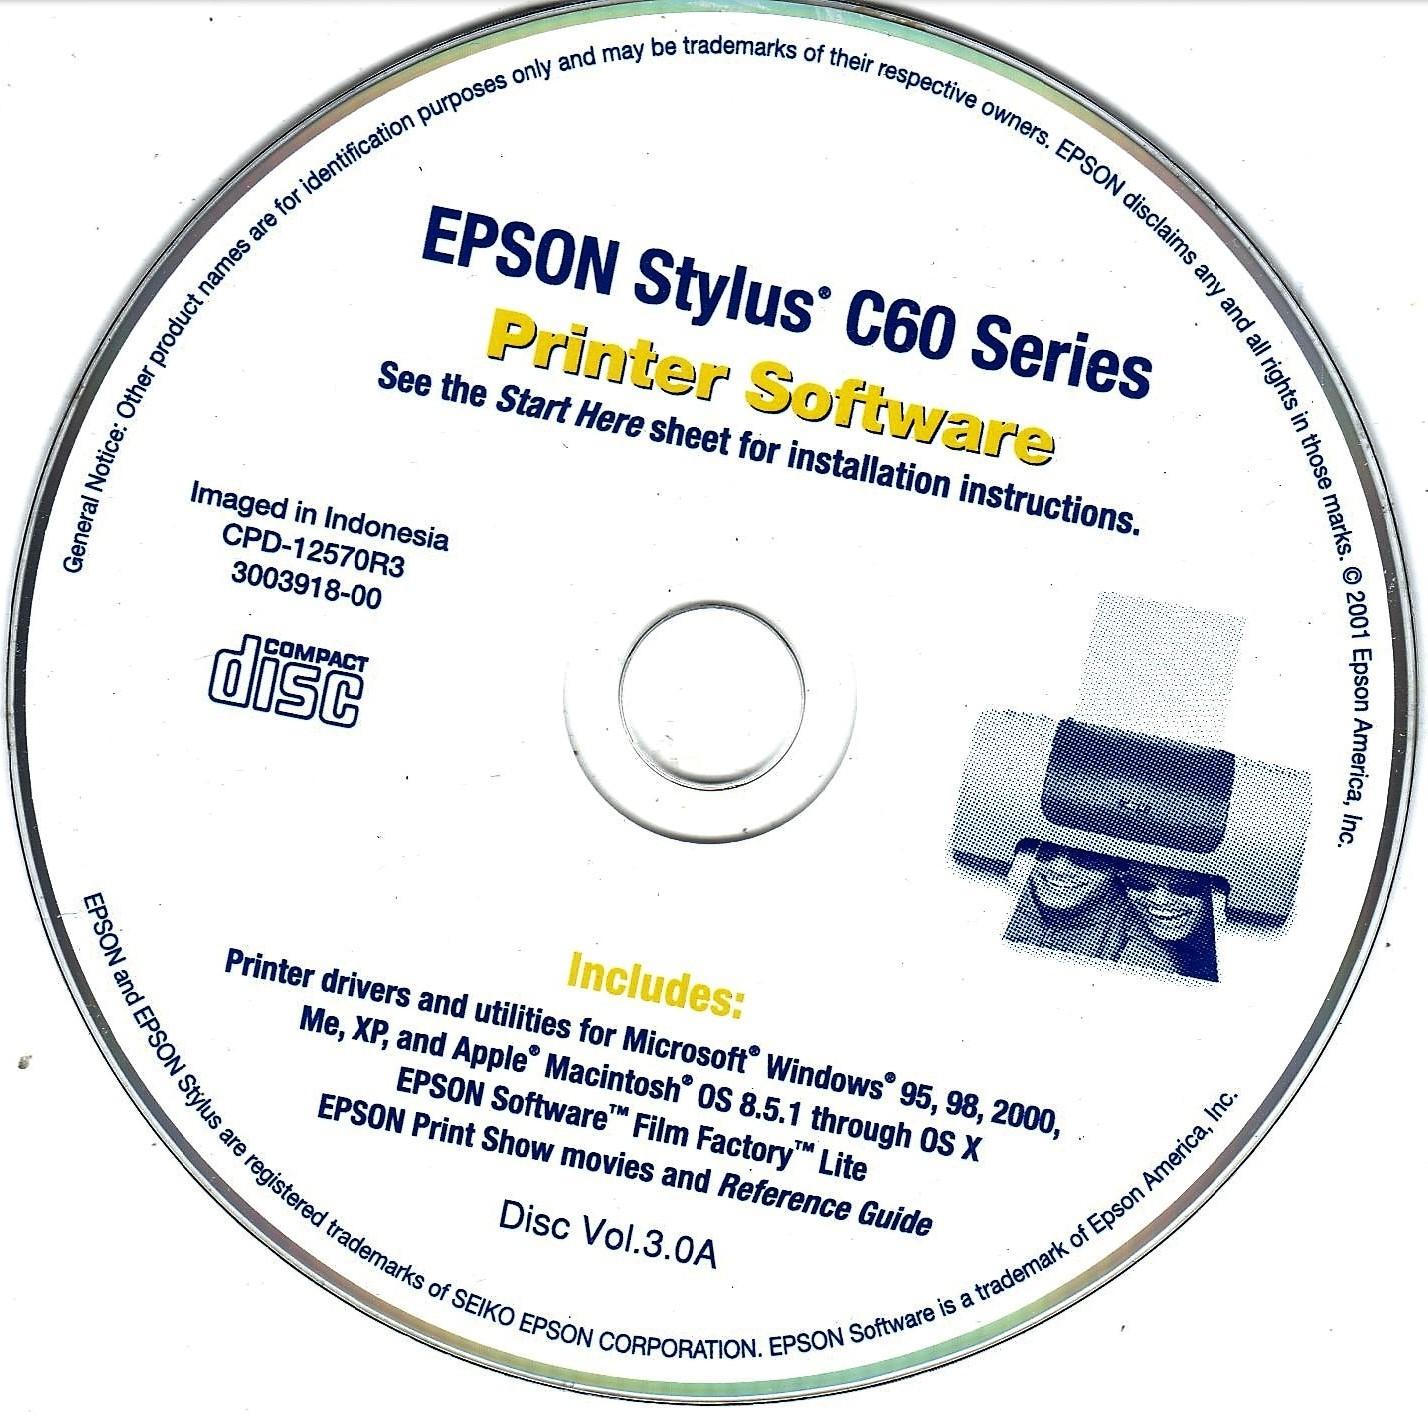 Epson Printer Software 740  C60, 850Ne, & 800